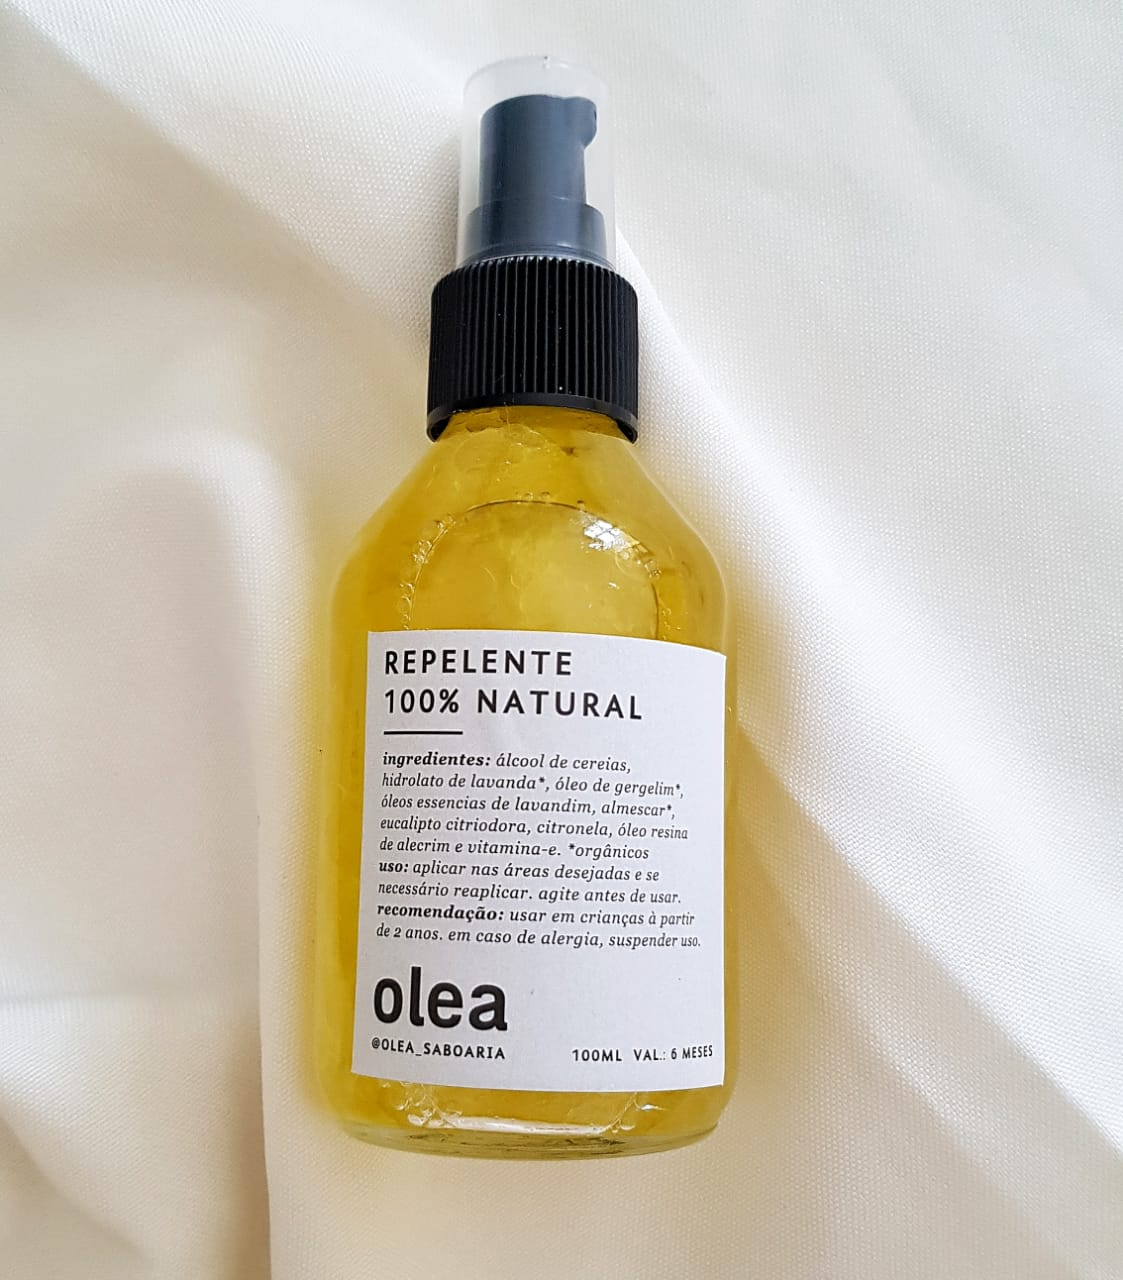 Repelente Natural - Olea